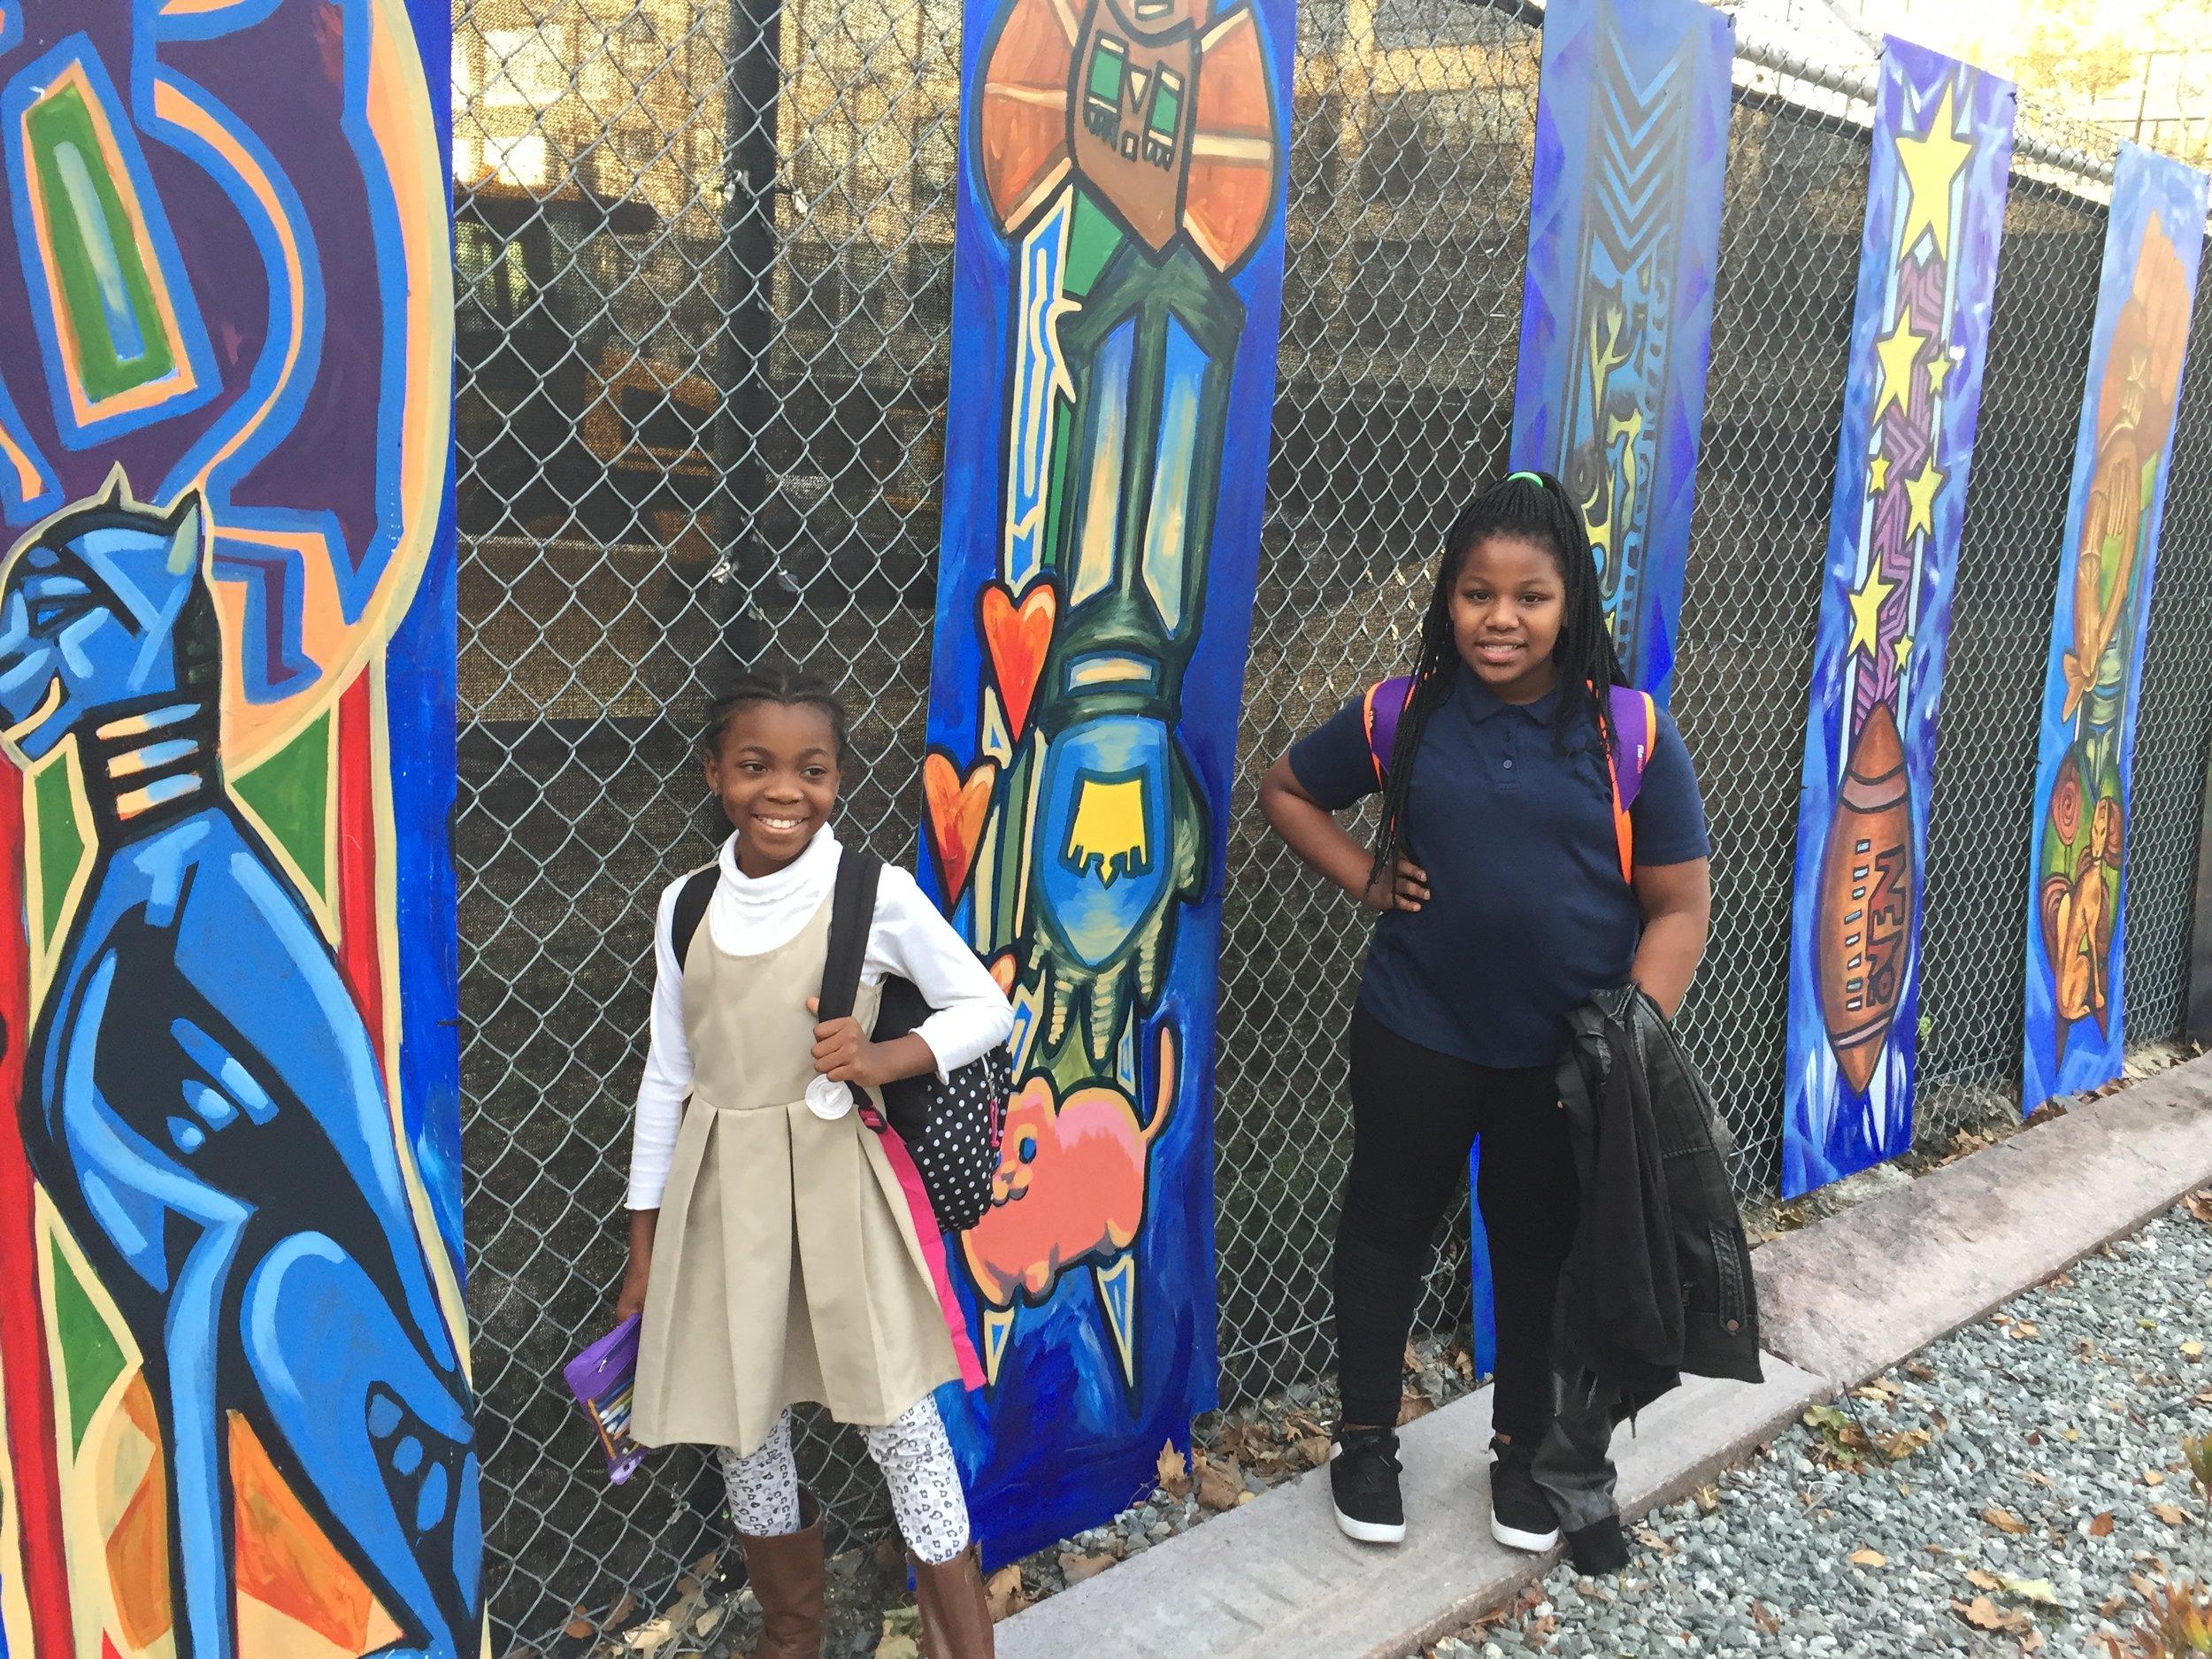 3rd & Binney - Totem Artists from the Community Art Center